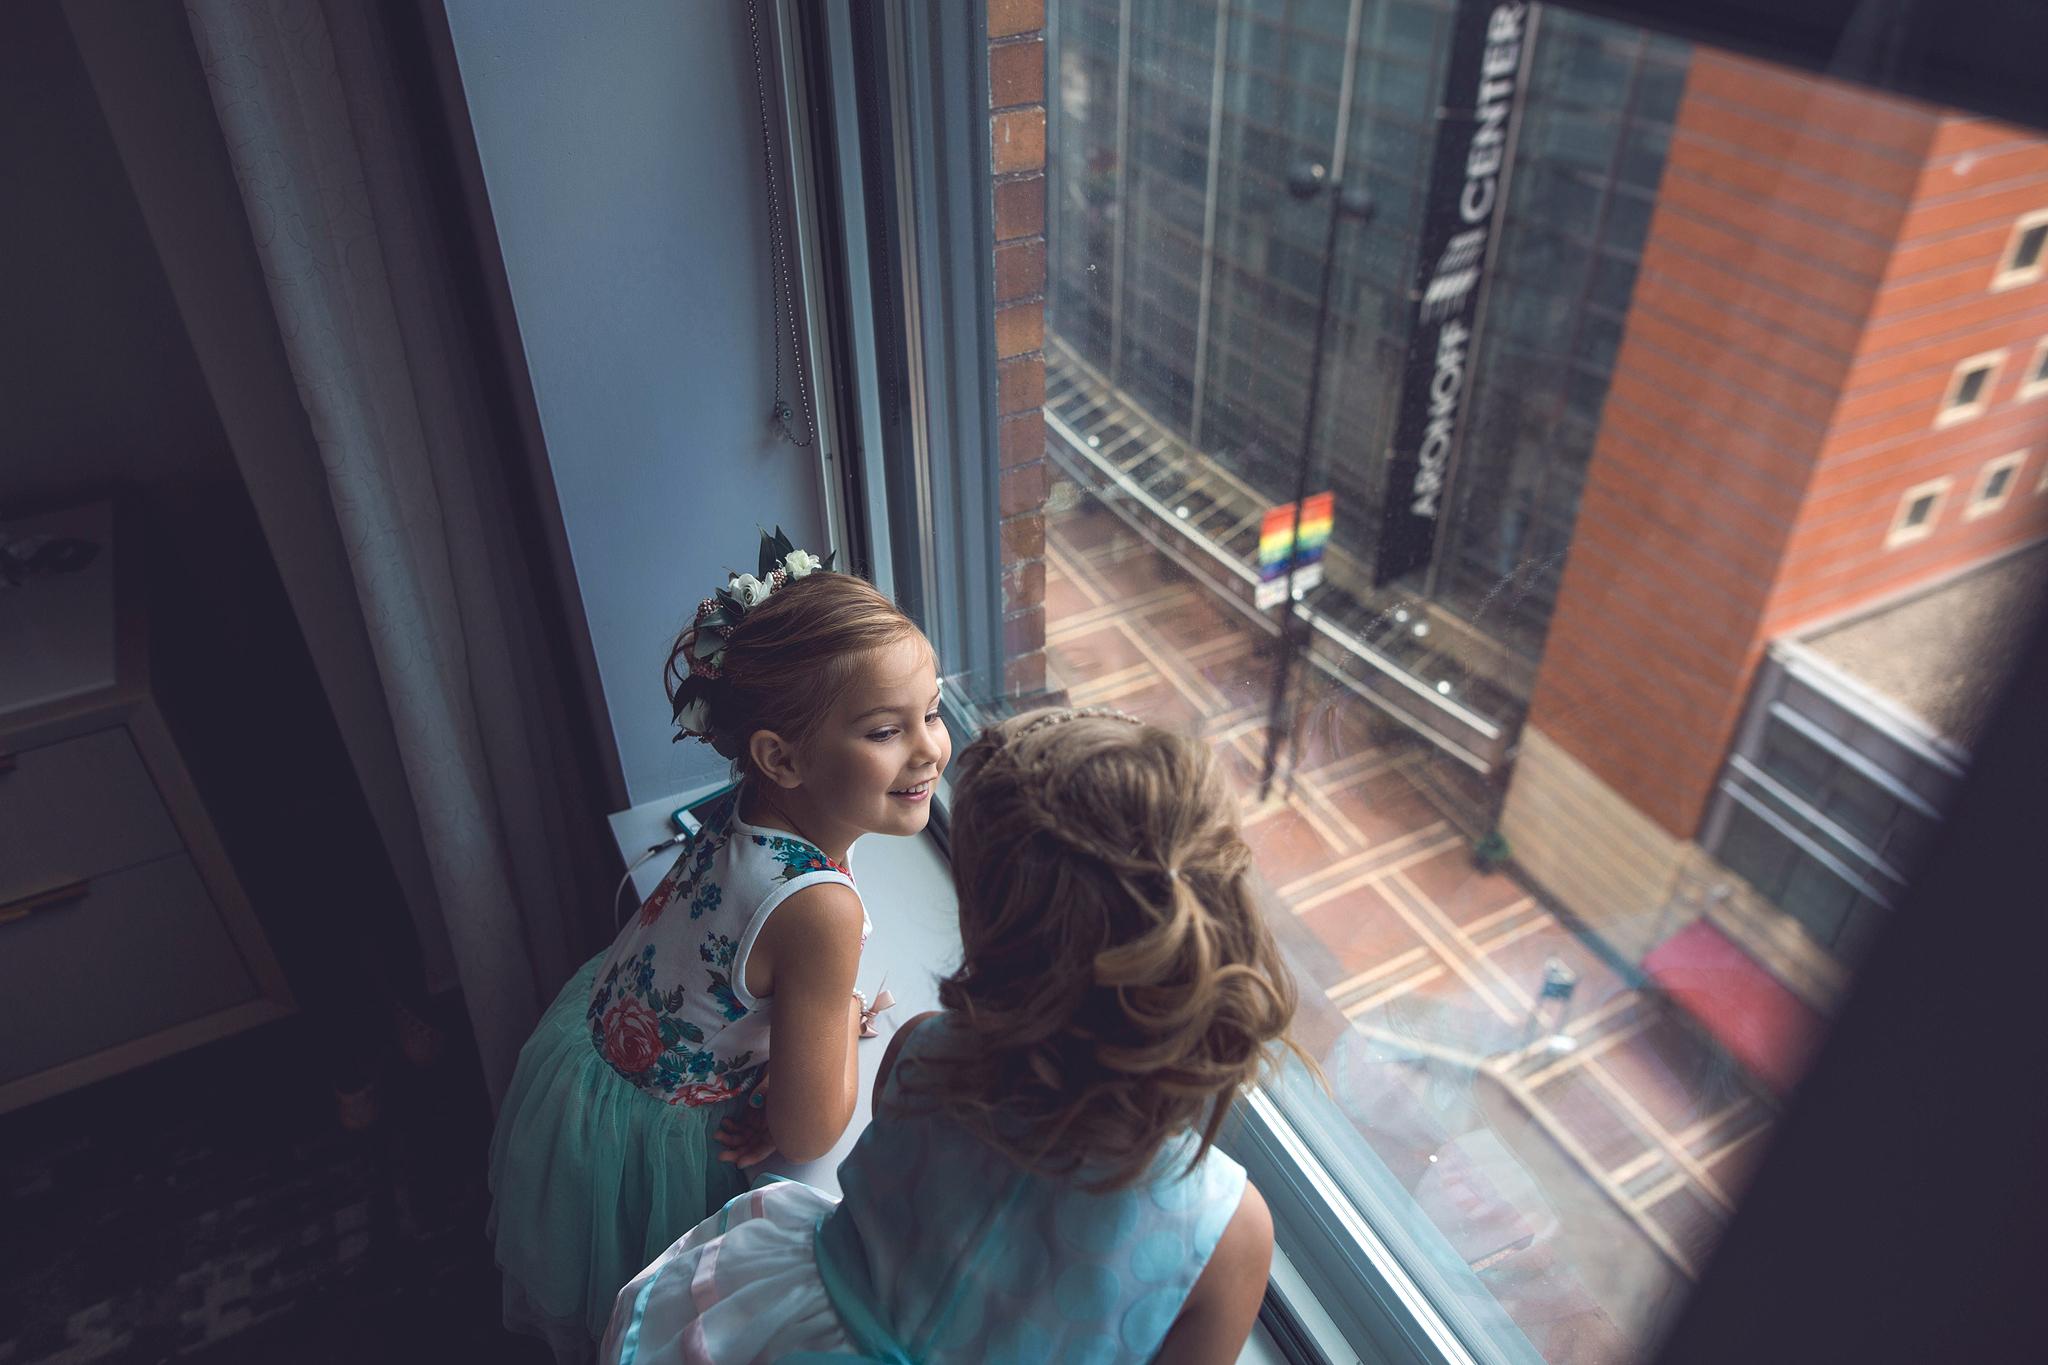 Cincinnati-Dayton-OH-Traveling-Wedding-Photographer-Rhinegeist-Brewery-Ault-Park-21C-42.jpg